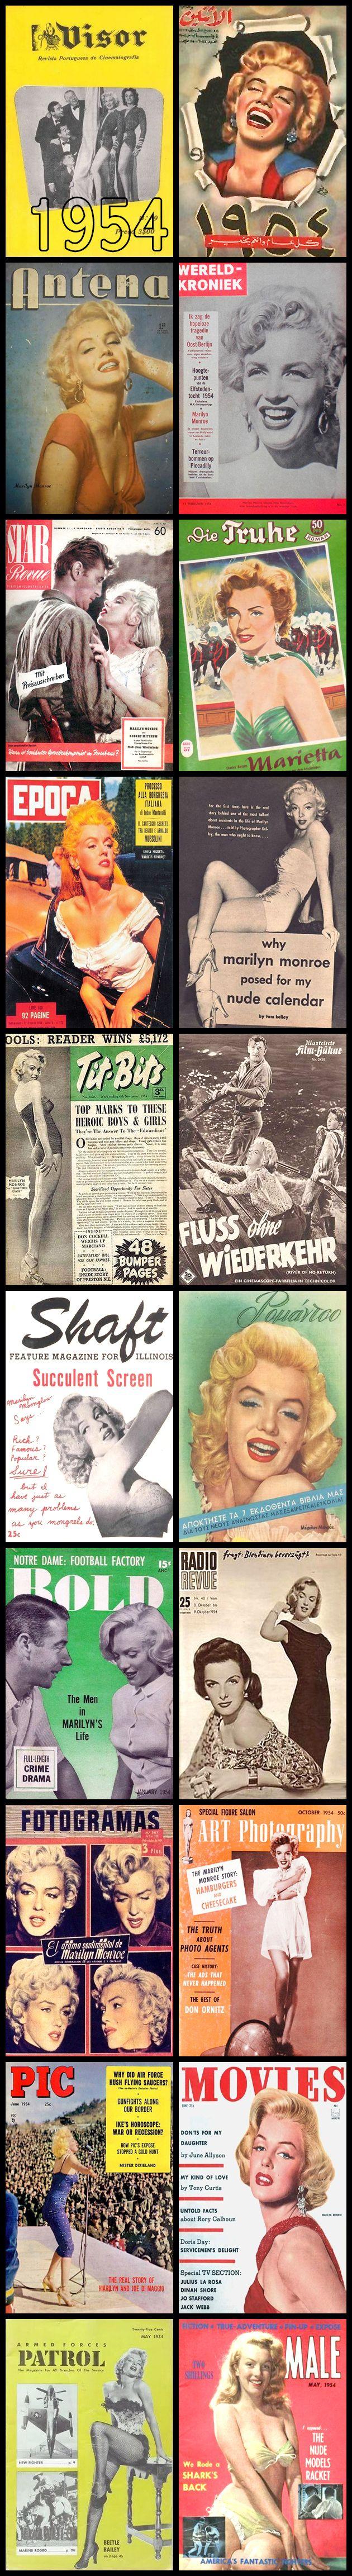 1954 magazine covers of Marilyn Monroe